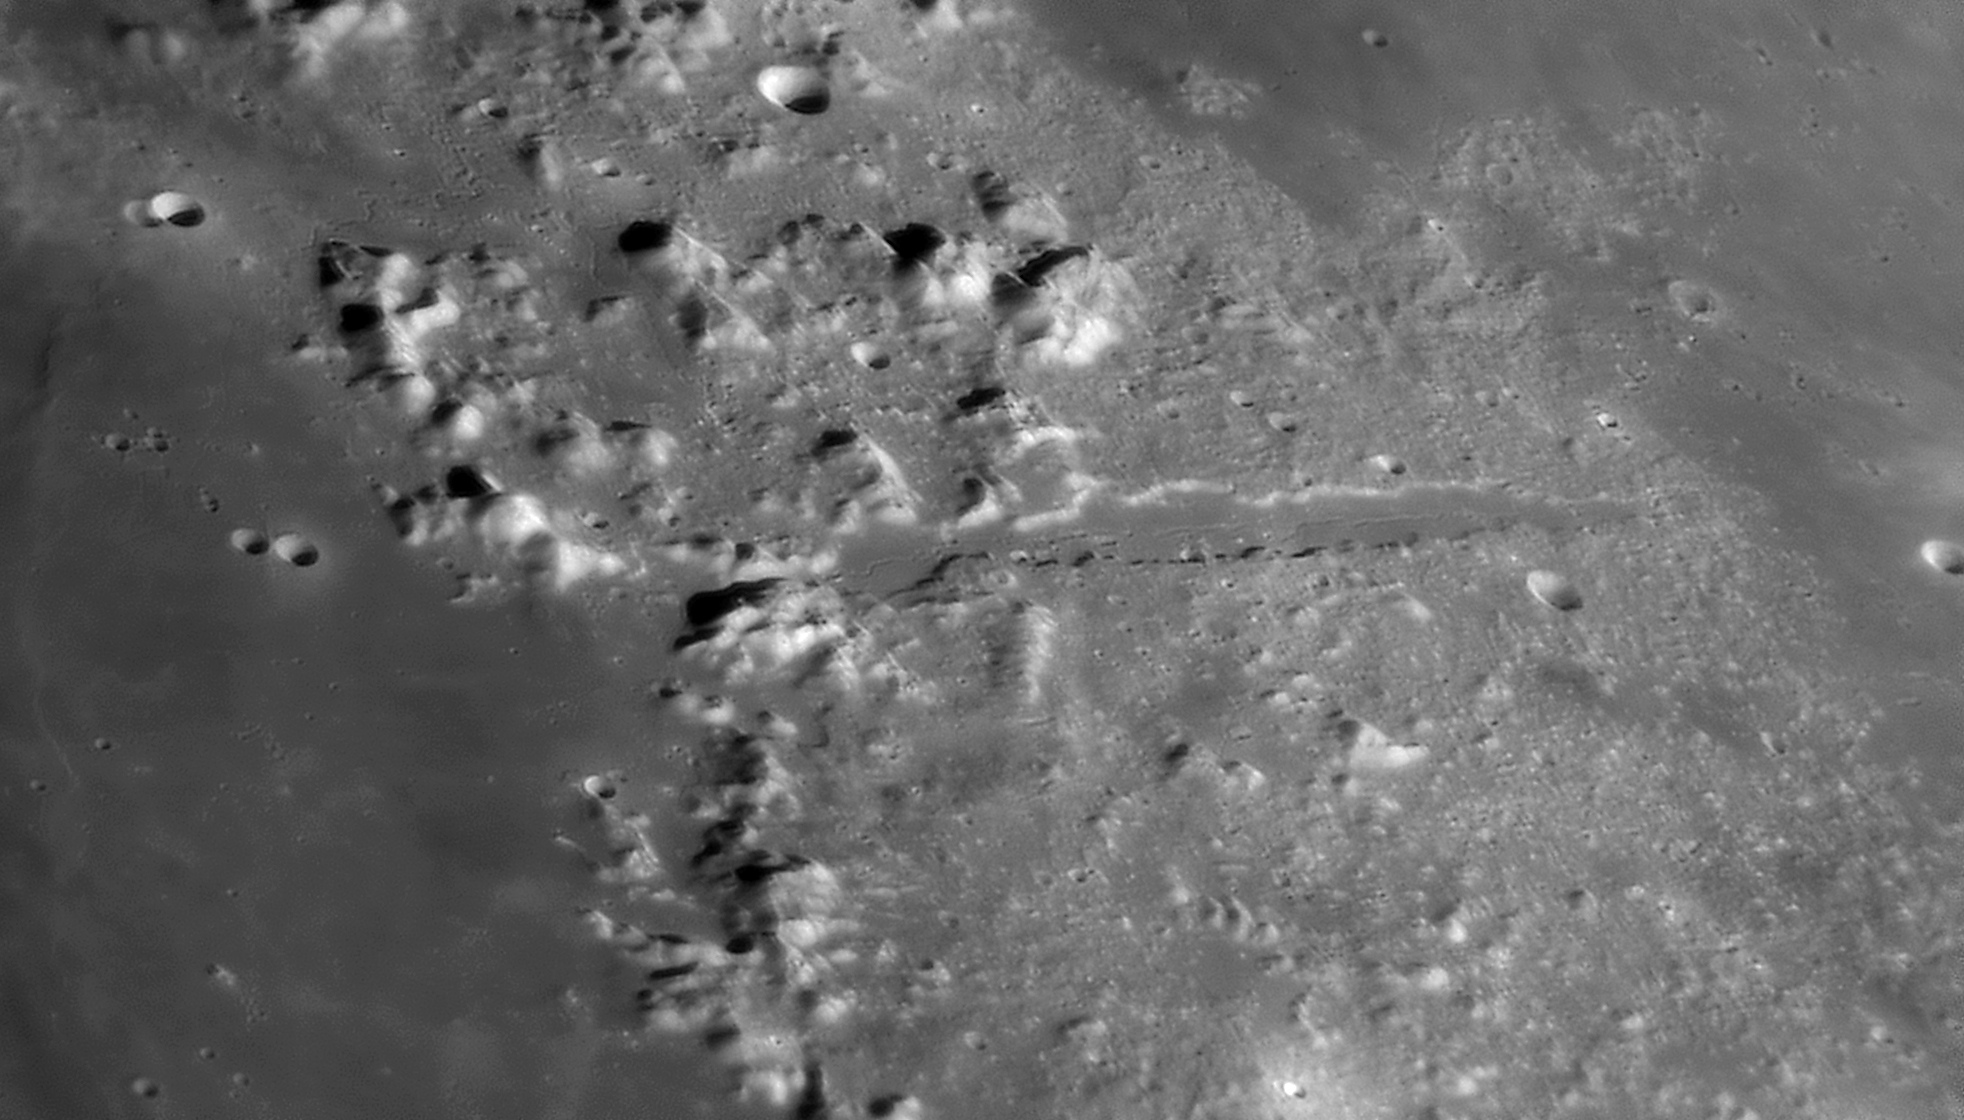 large.moon_03_04_2020_CAS-PLATON.jpg.c12765e08963cc9c9a50686526b4f99f.jpg